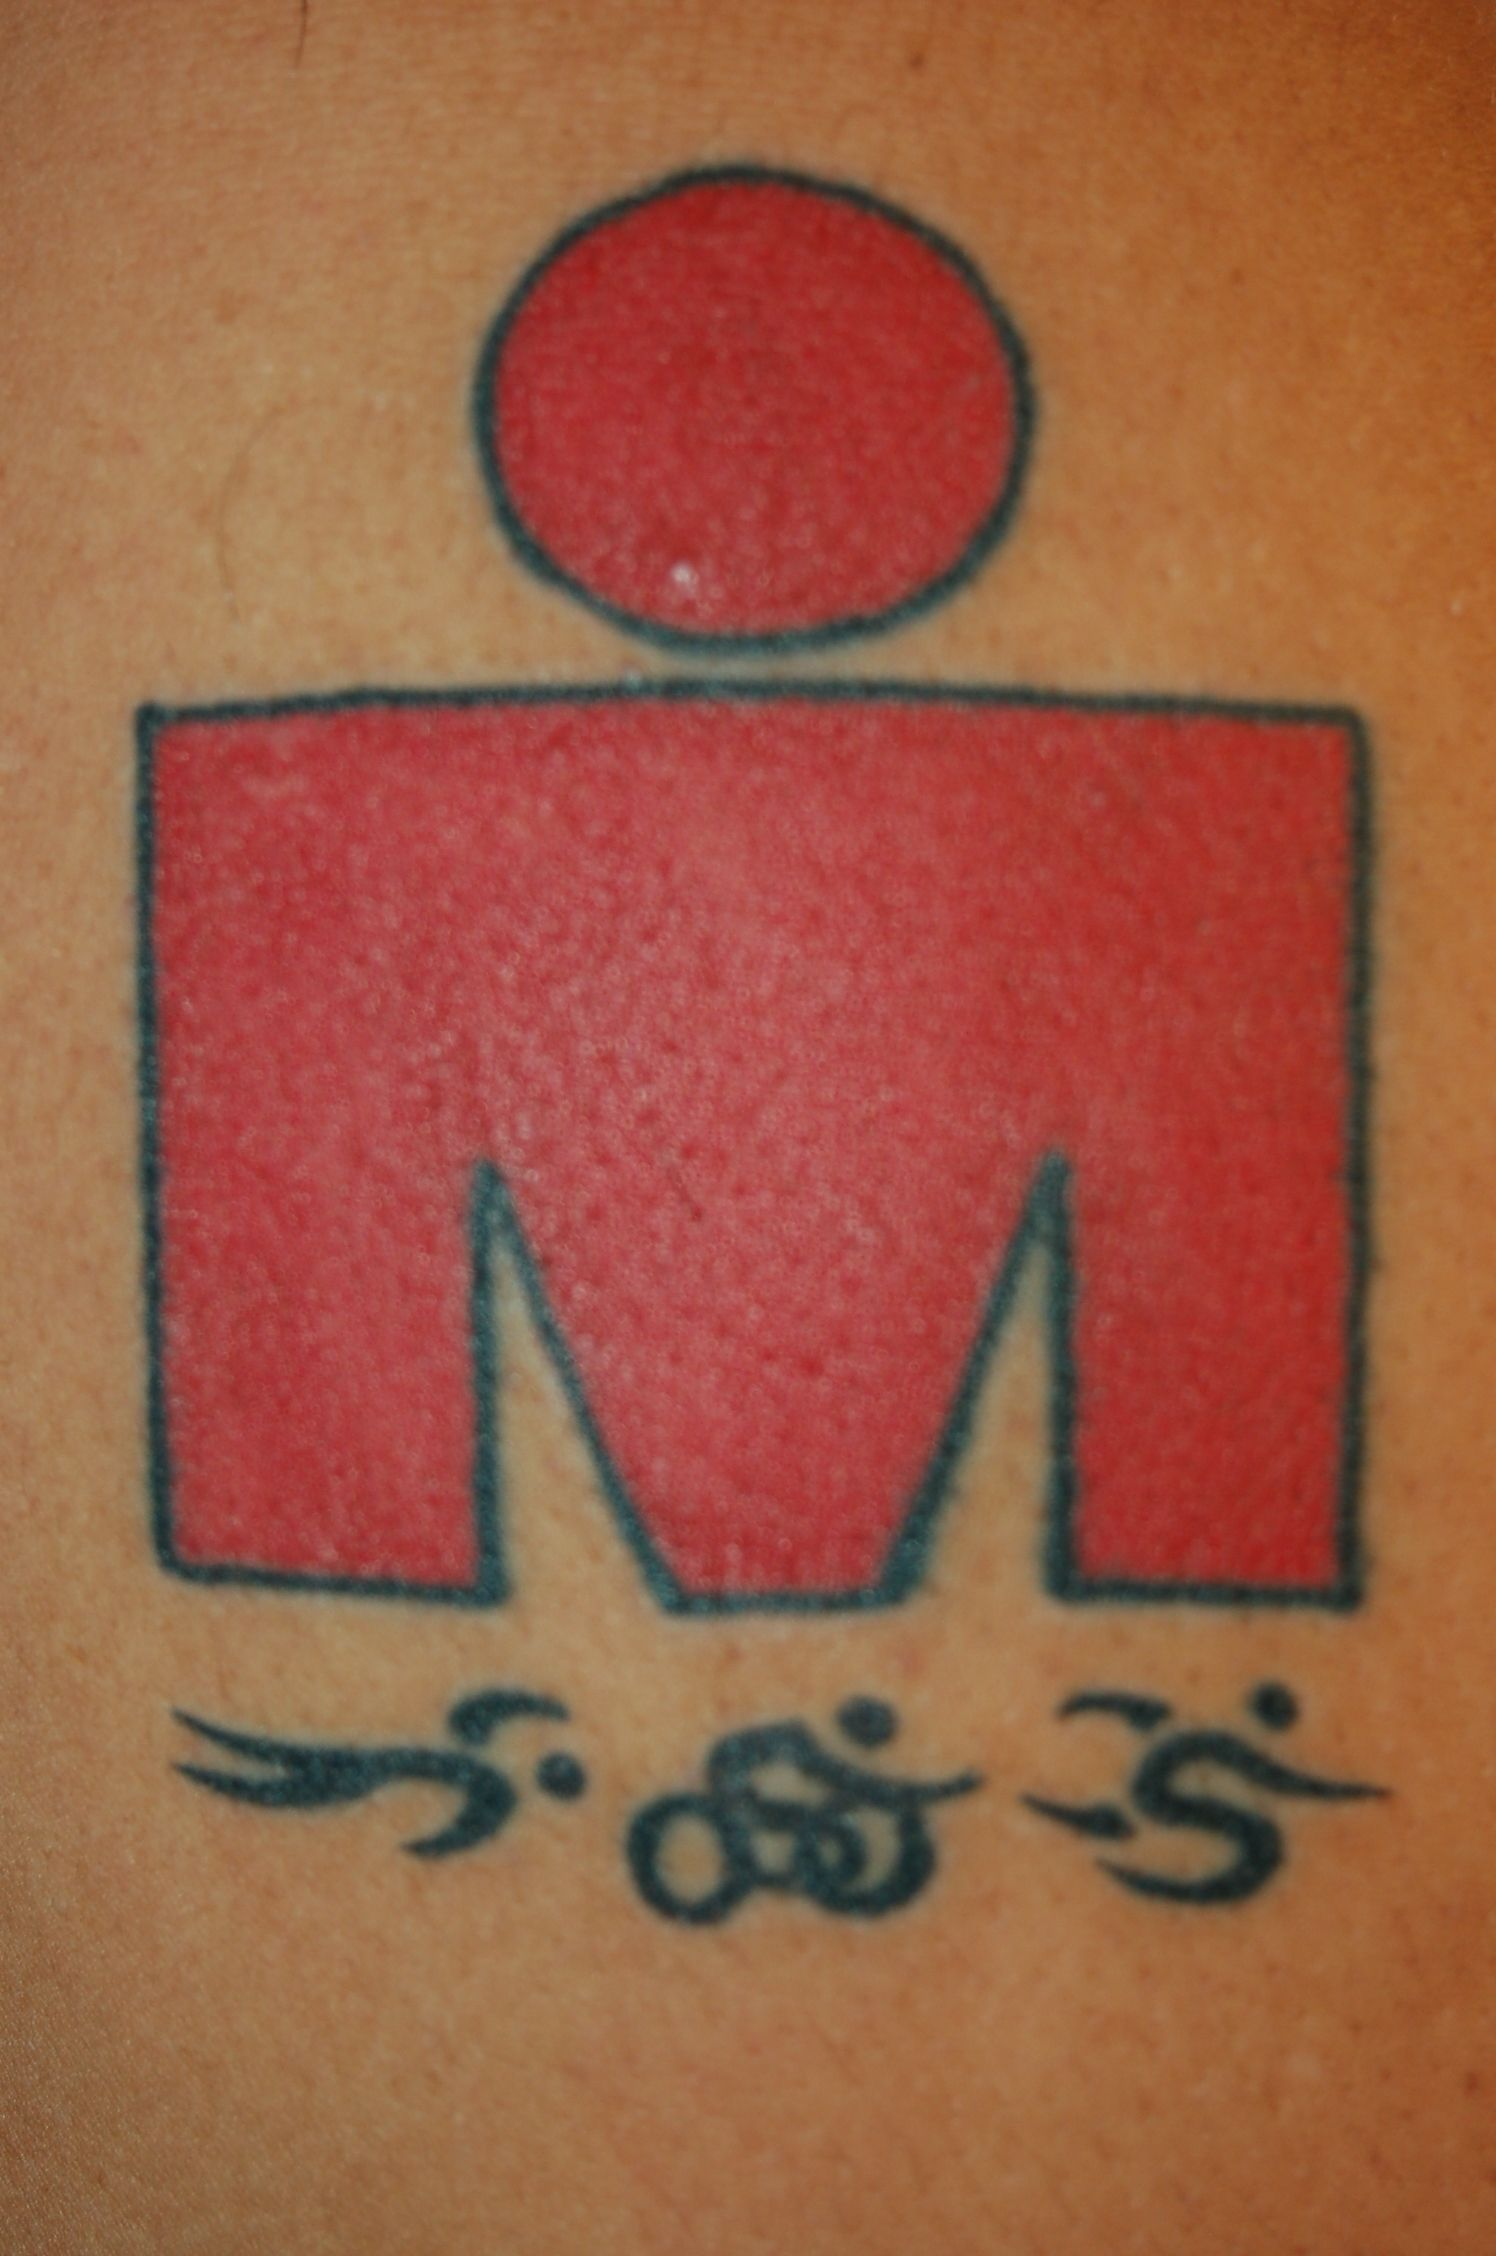 Show Me Your Mdot Inked Im Ers Iamtri Iron Man Tattoo Time Tattoos Triathlon Tattoo